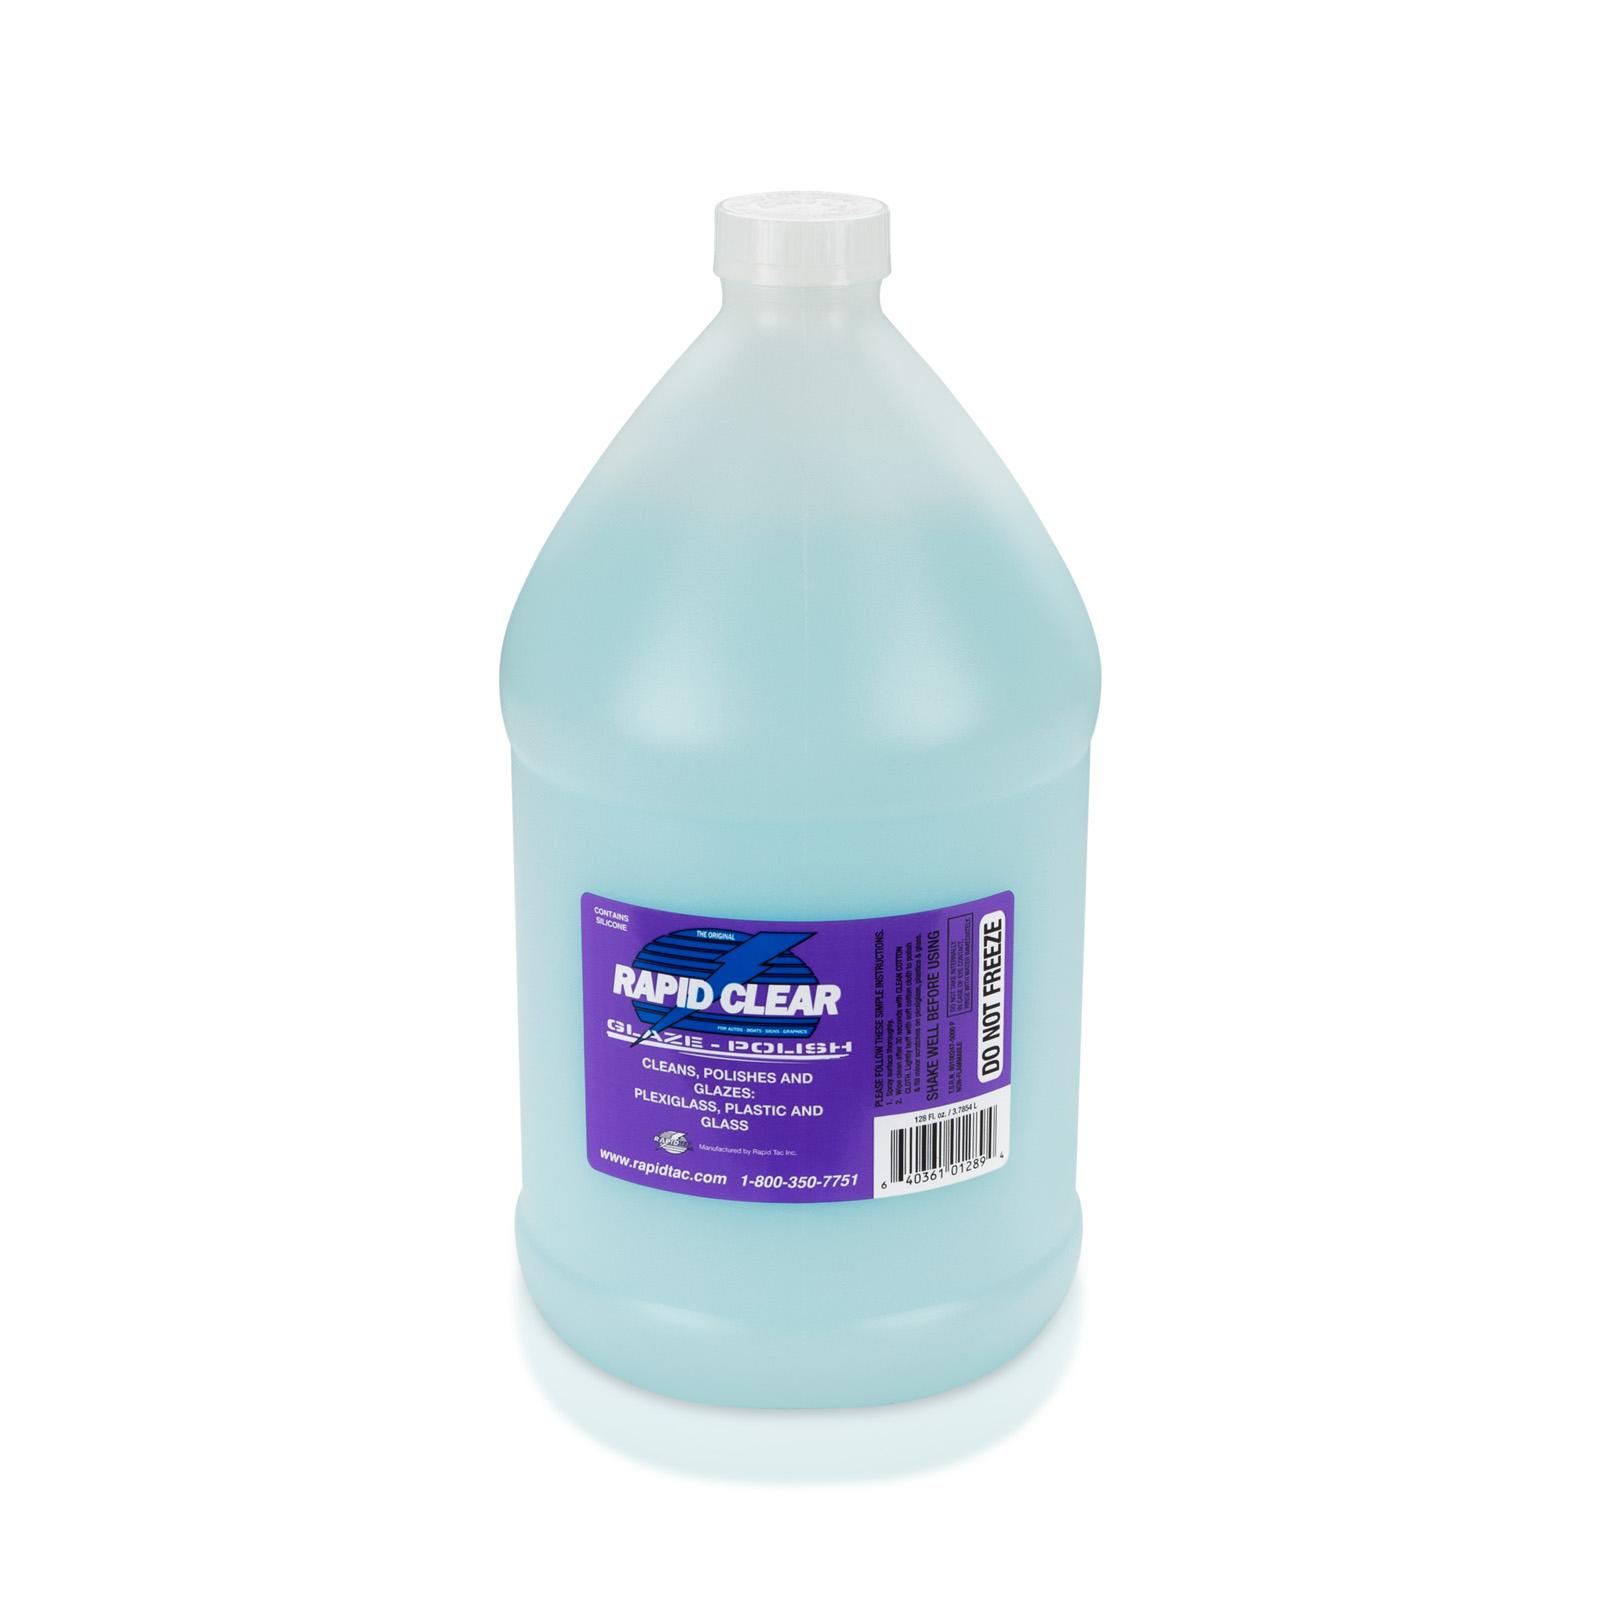 Rapid Tac Rapid Clear, Film and Polycarbonate Polish, 1 Gallon Jug